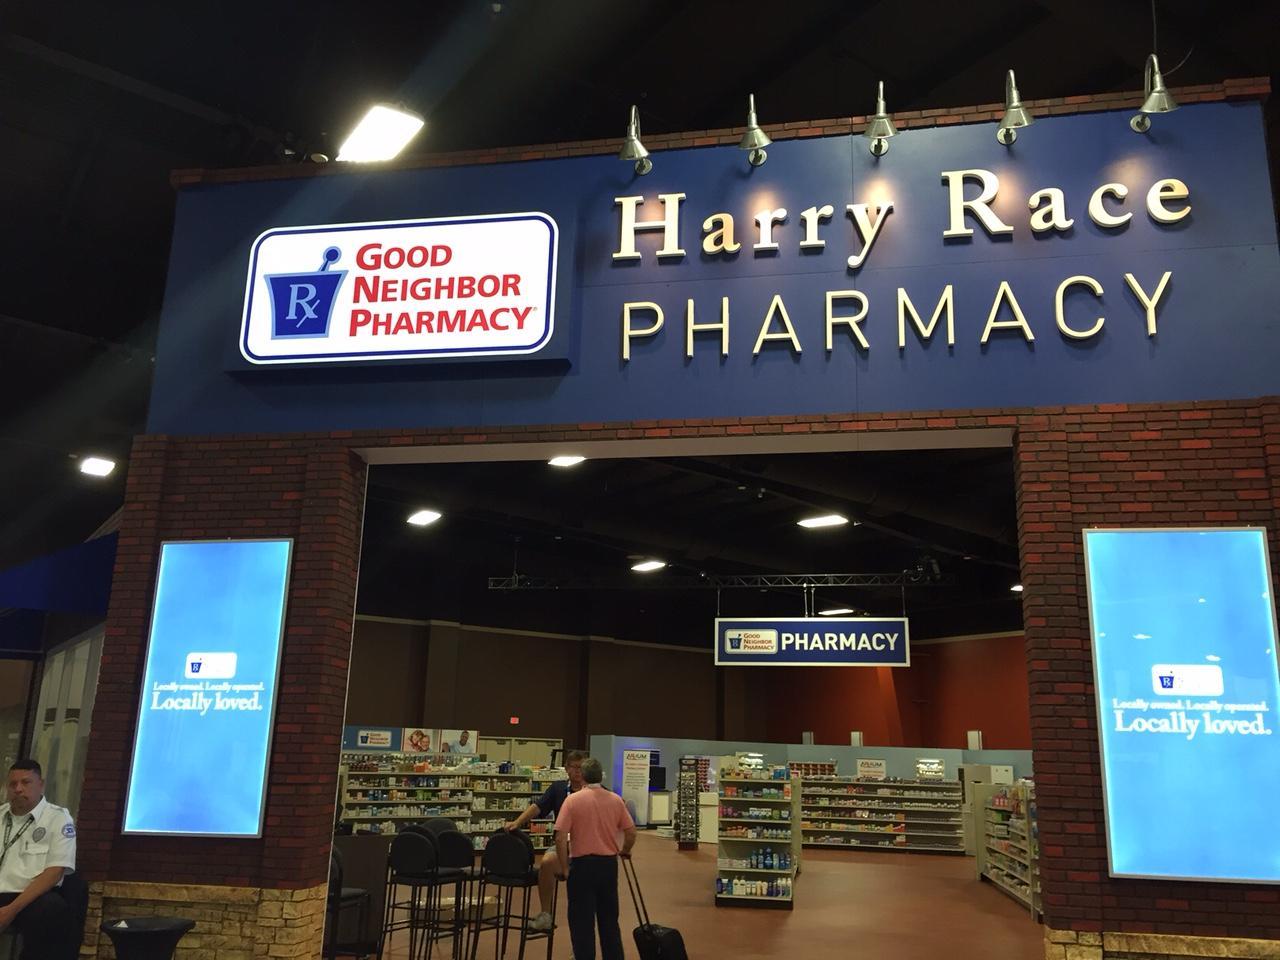 RMS_POS_GNP_Harry_Race